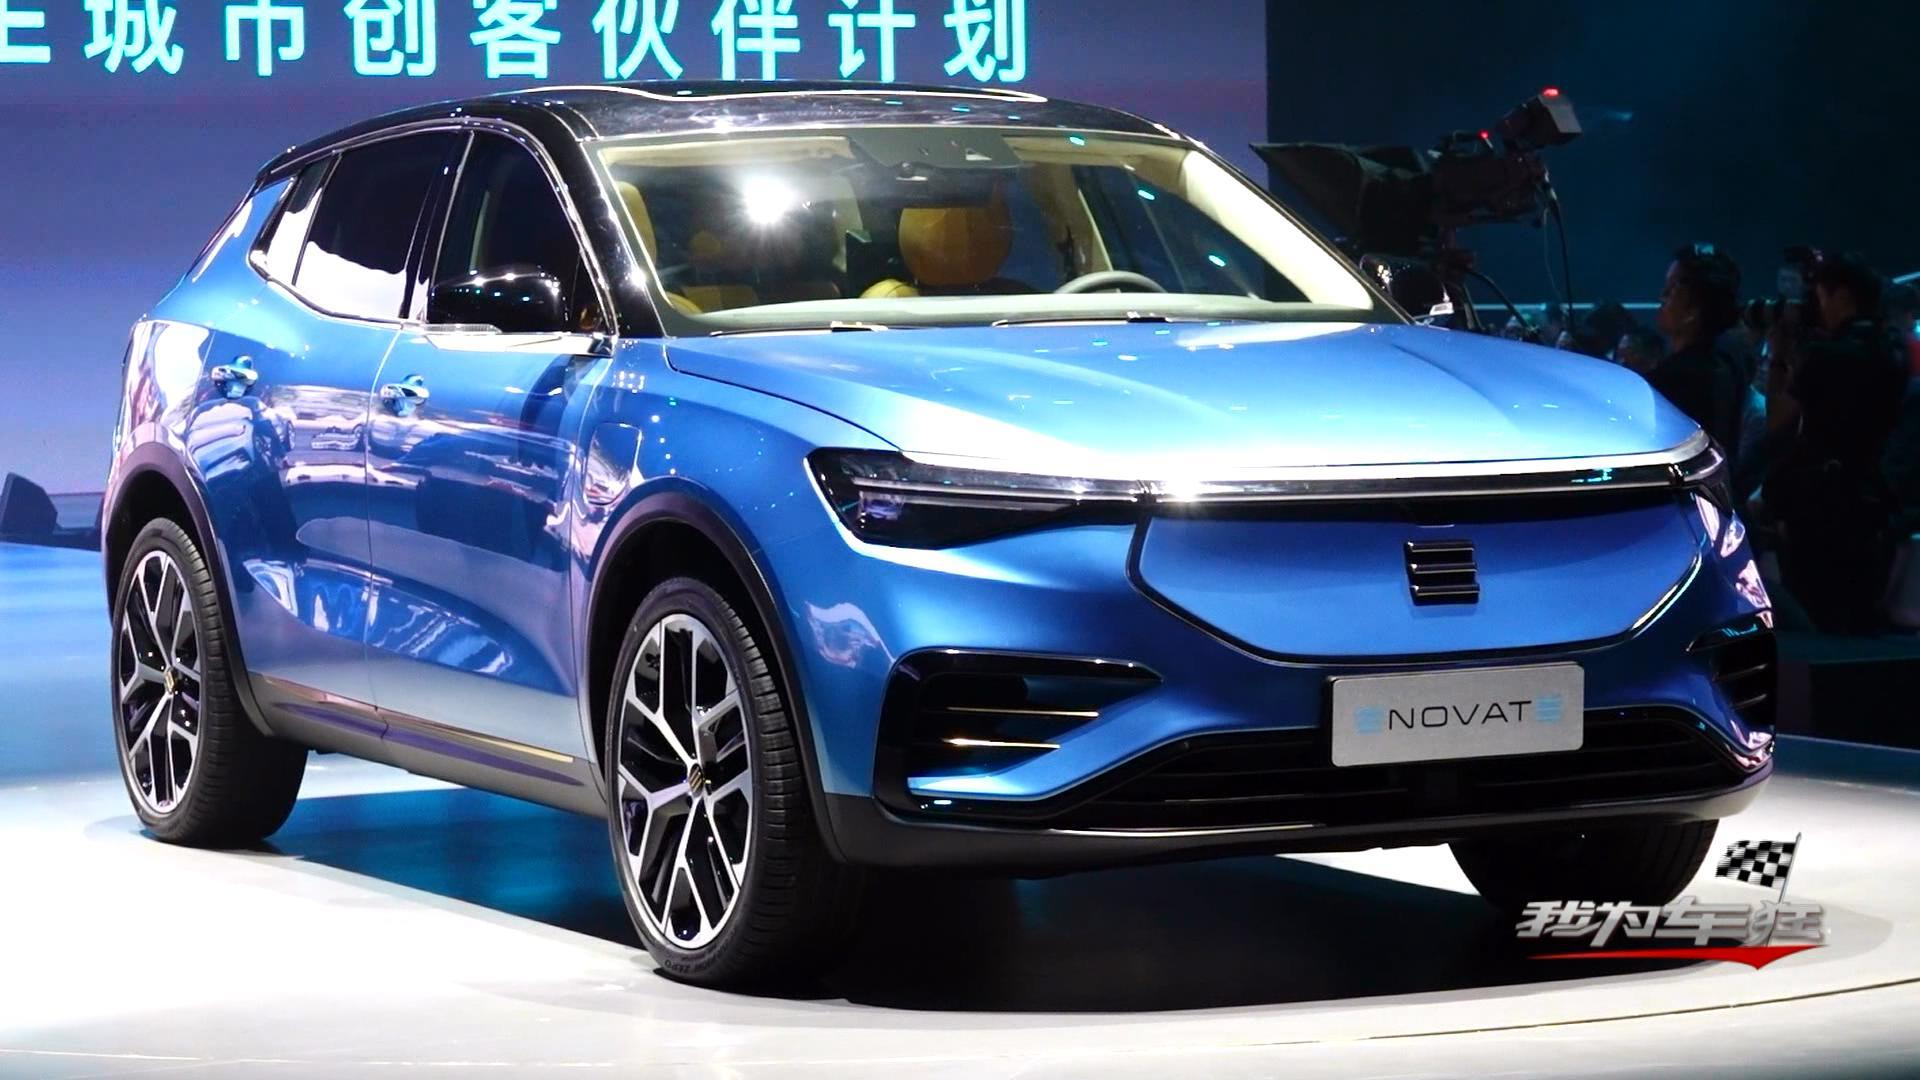 ENOVATE发布中文名天际 智能电动SUV ME7受瞩目